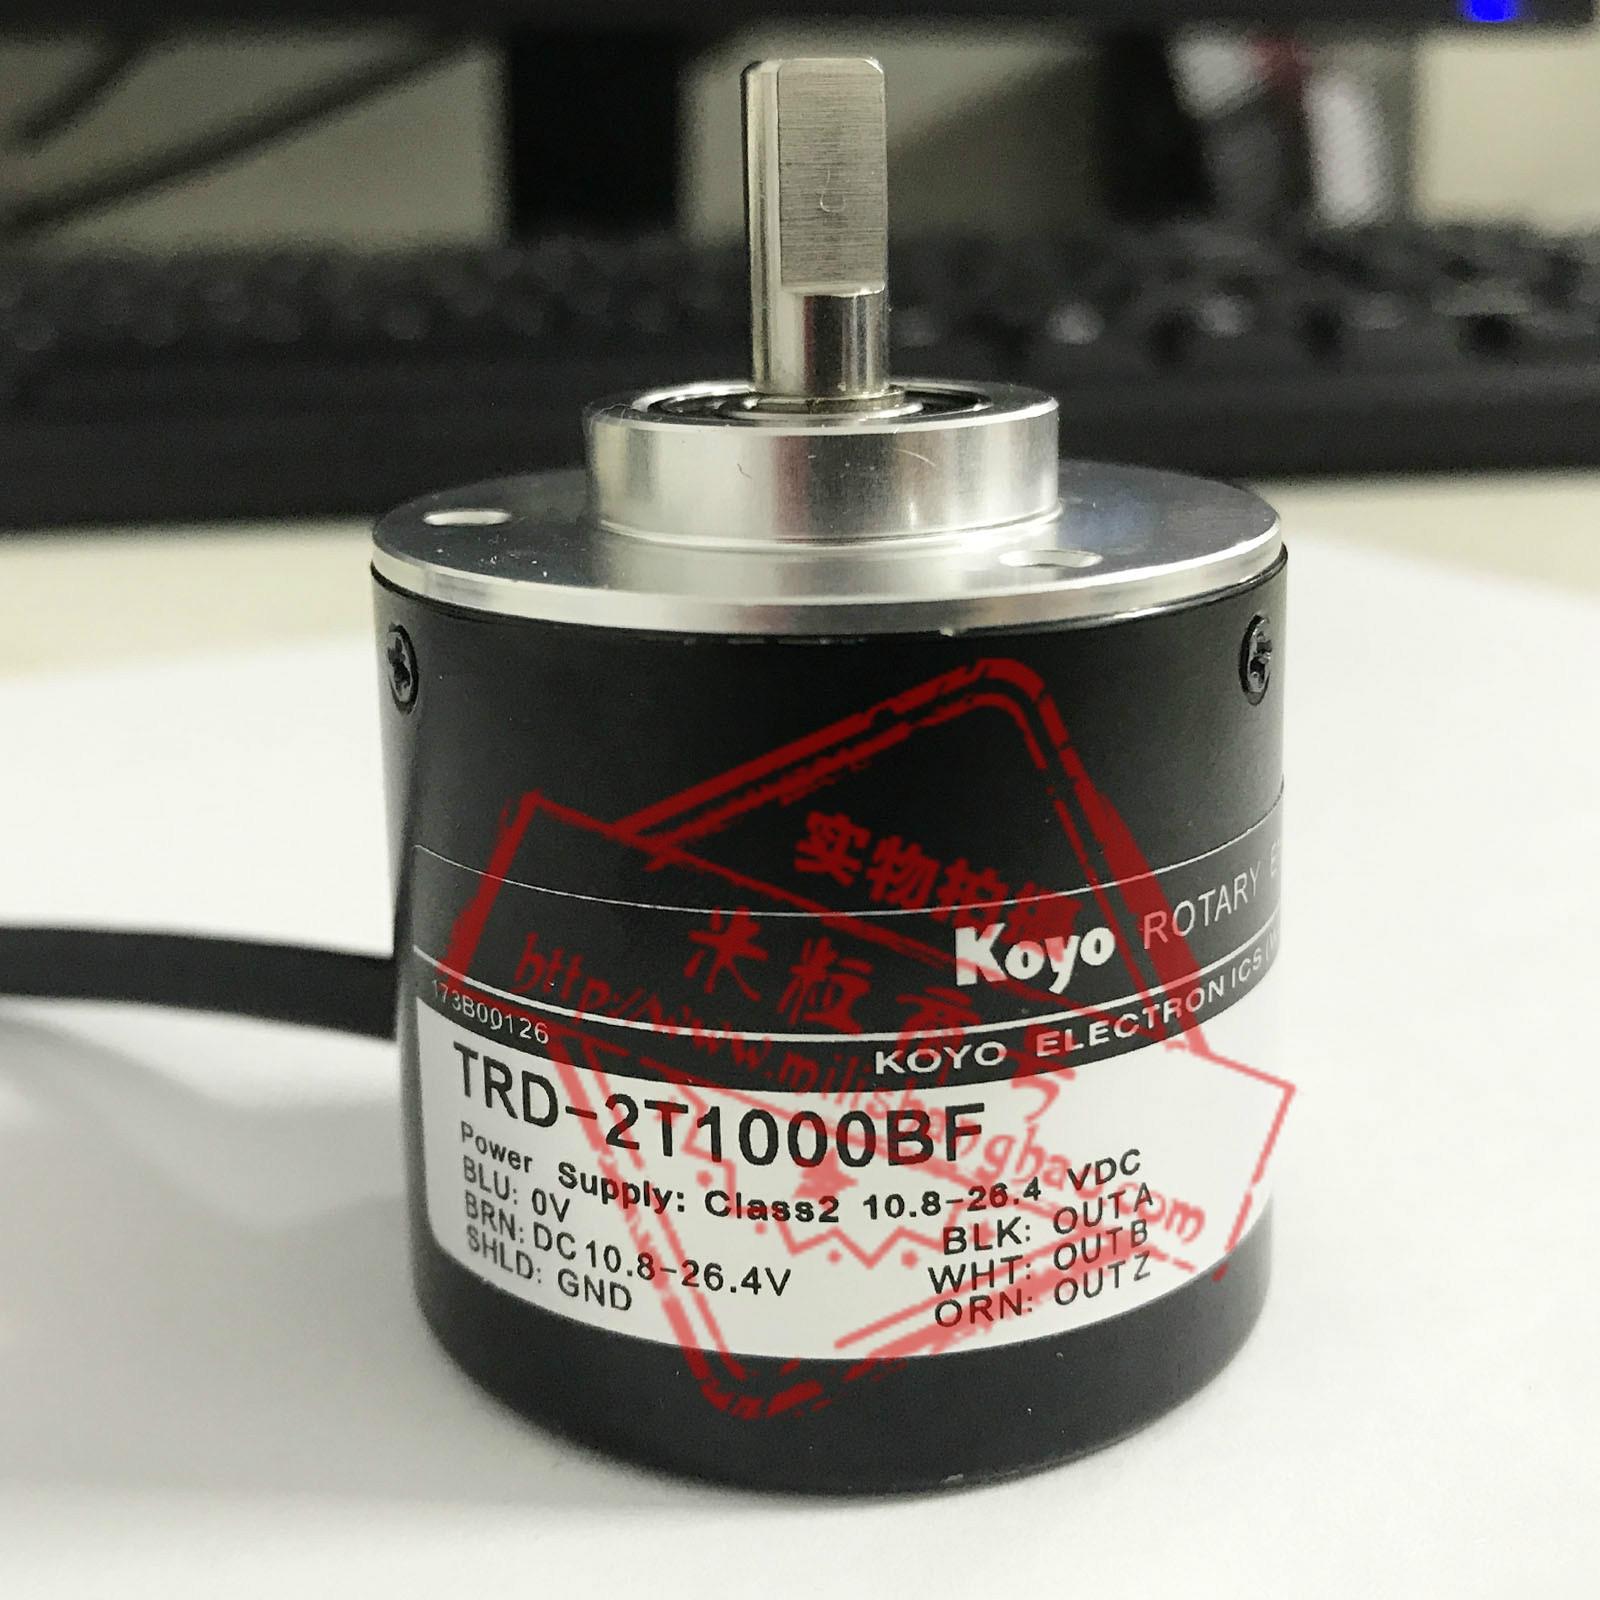 Свет иностранных вращение кодирование устройство TRD-2T1000BF-2T600 2T1024-2T360-2T2000-2T100